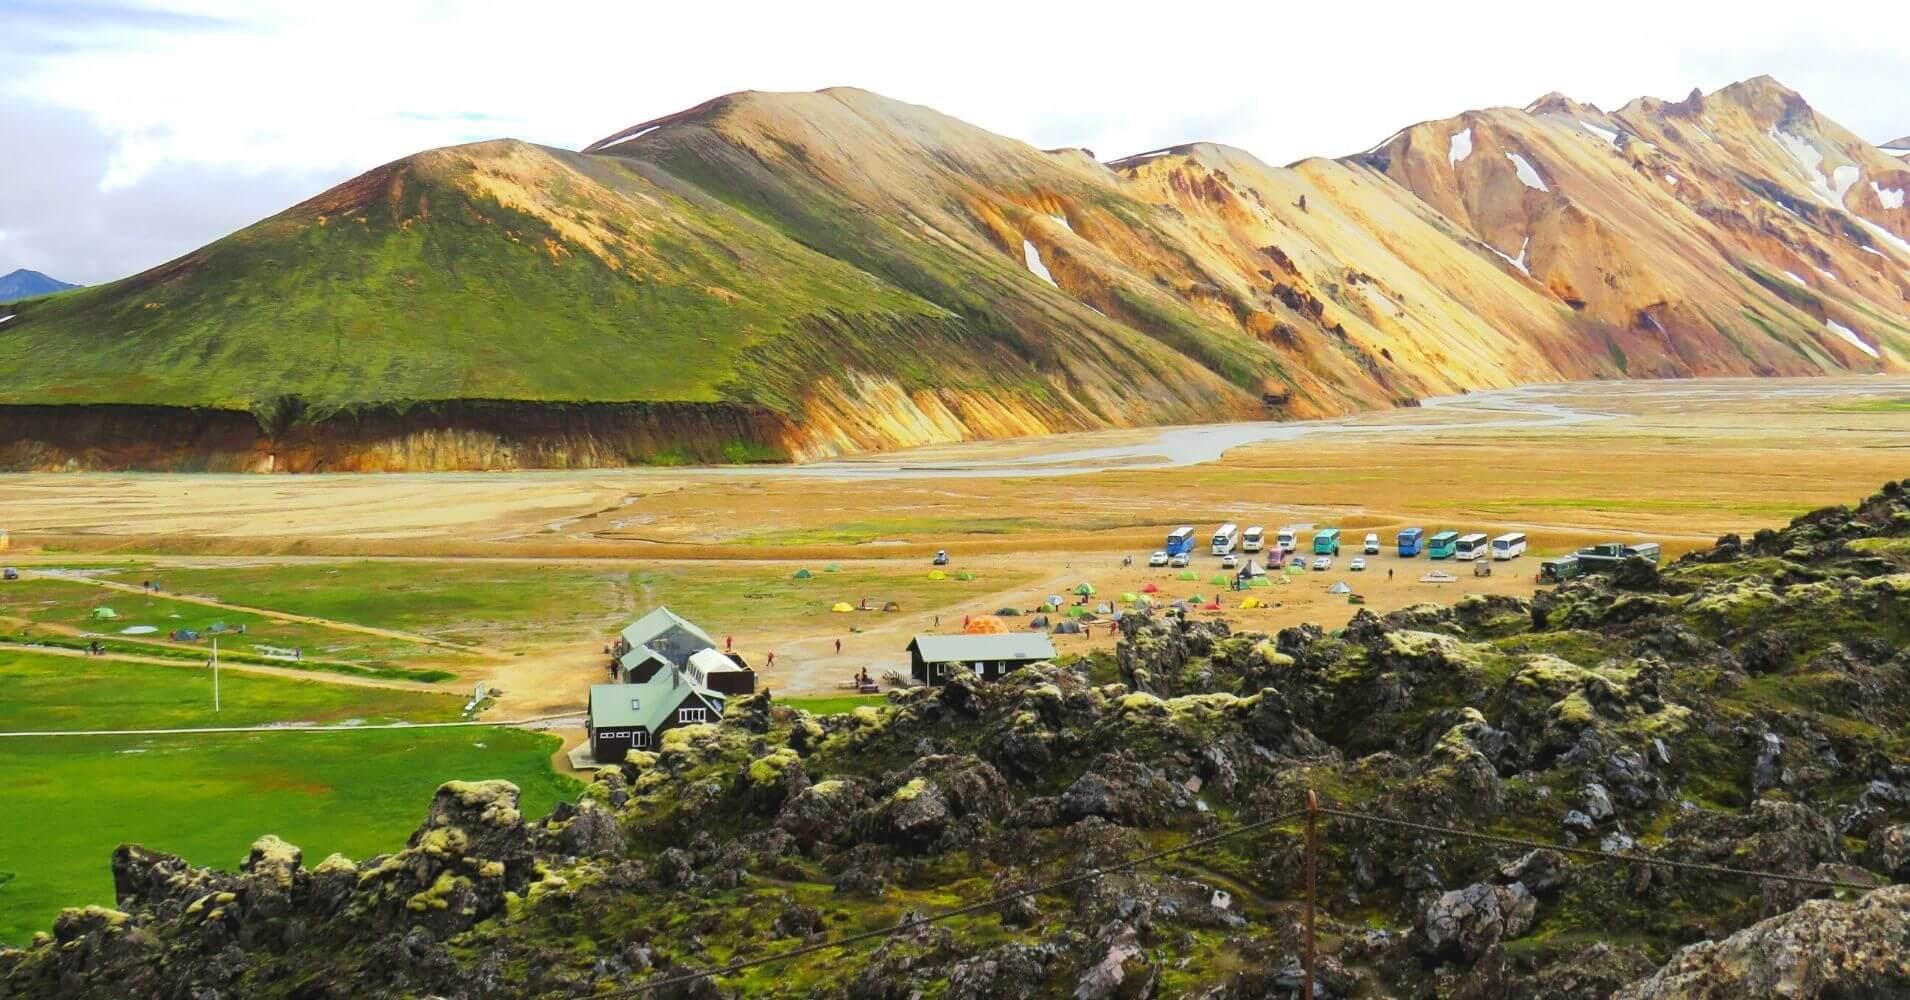 Camping de Landmannalaugar. Tierras Altas de Islandia.